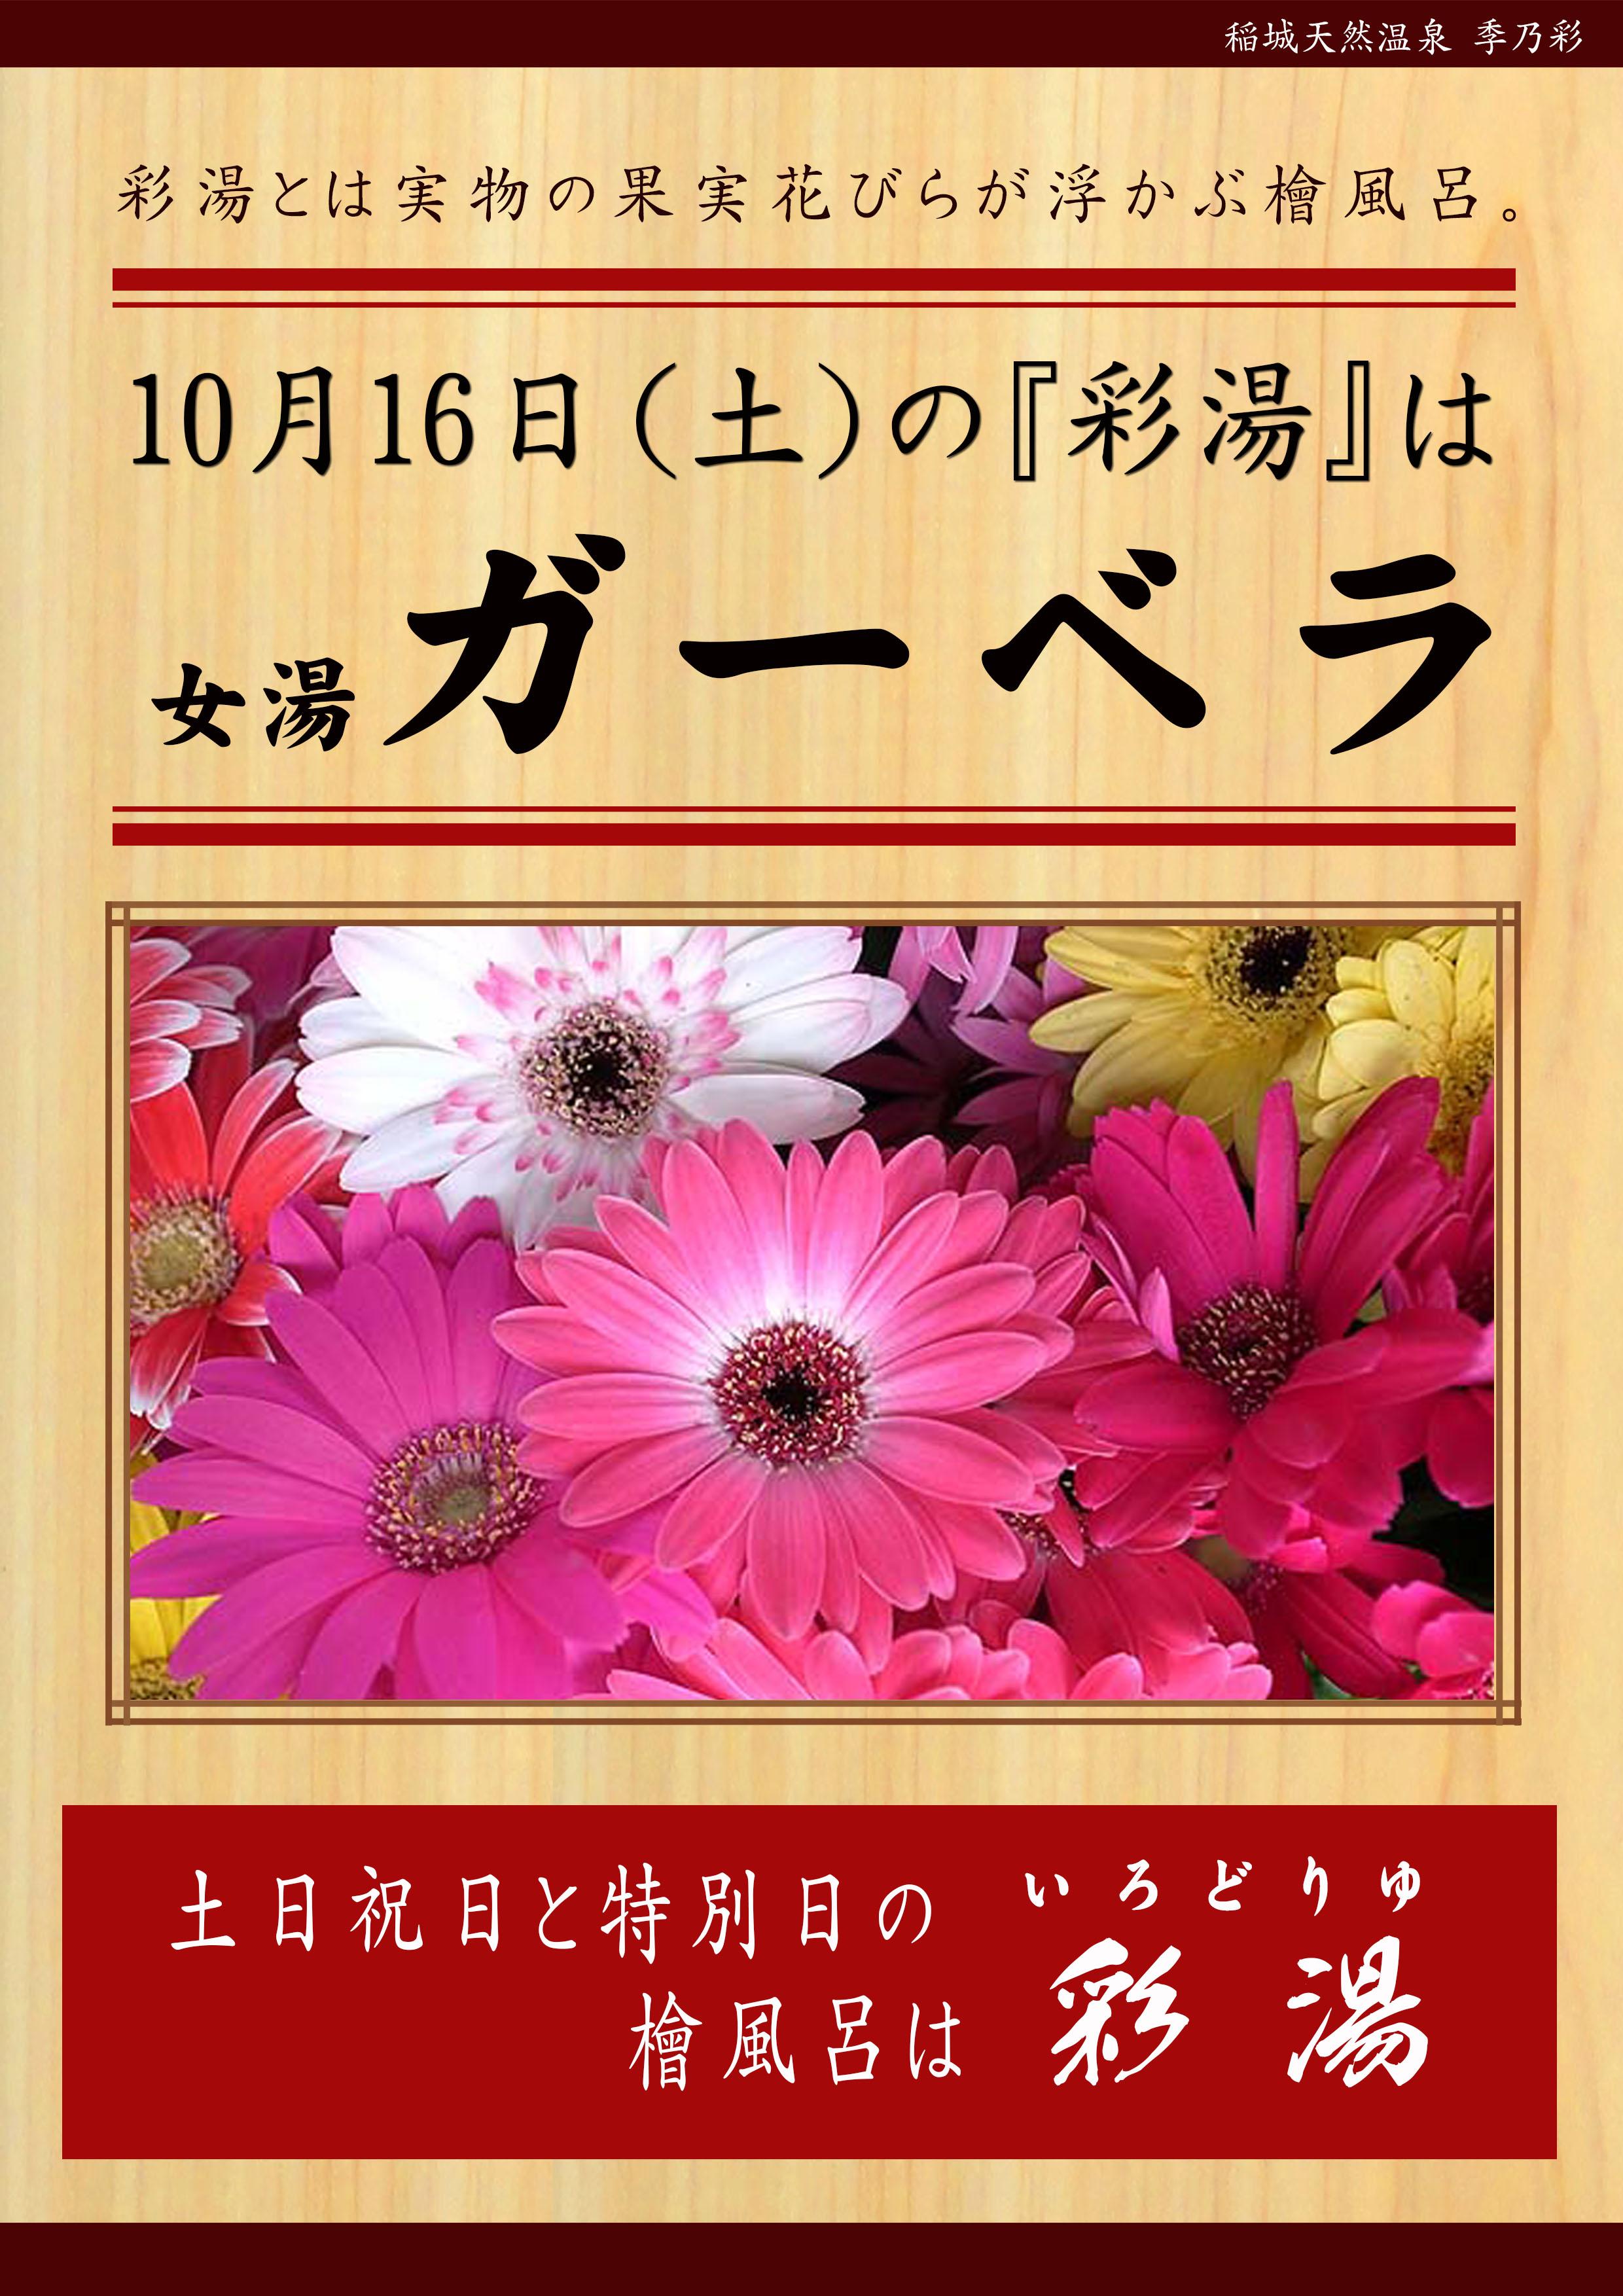 20211016 POP イベント 彩湯 女湯 ガーベラ